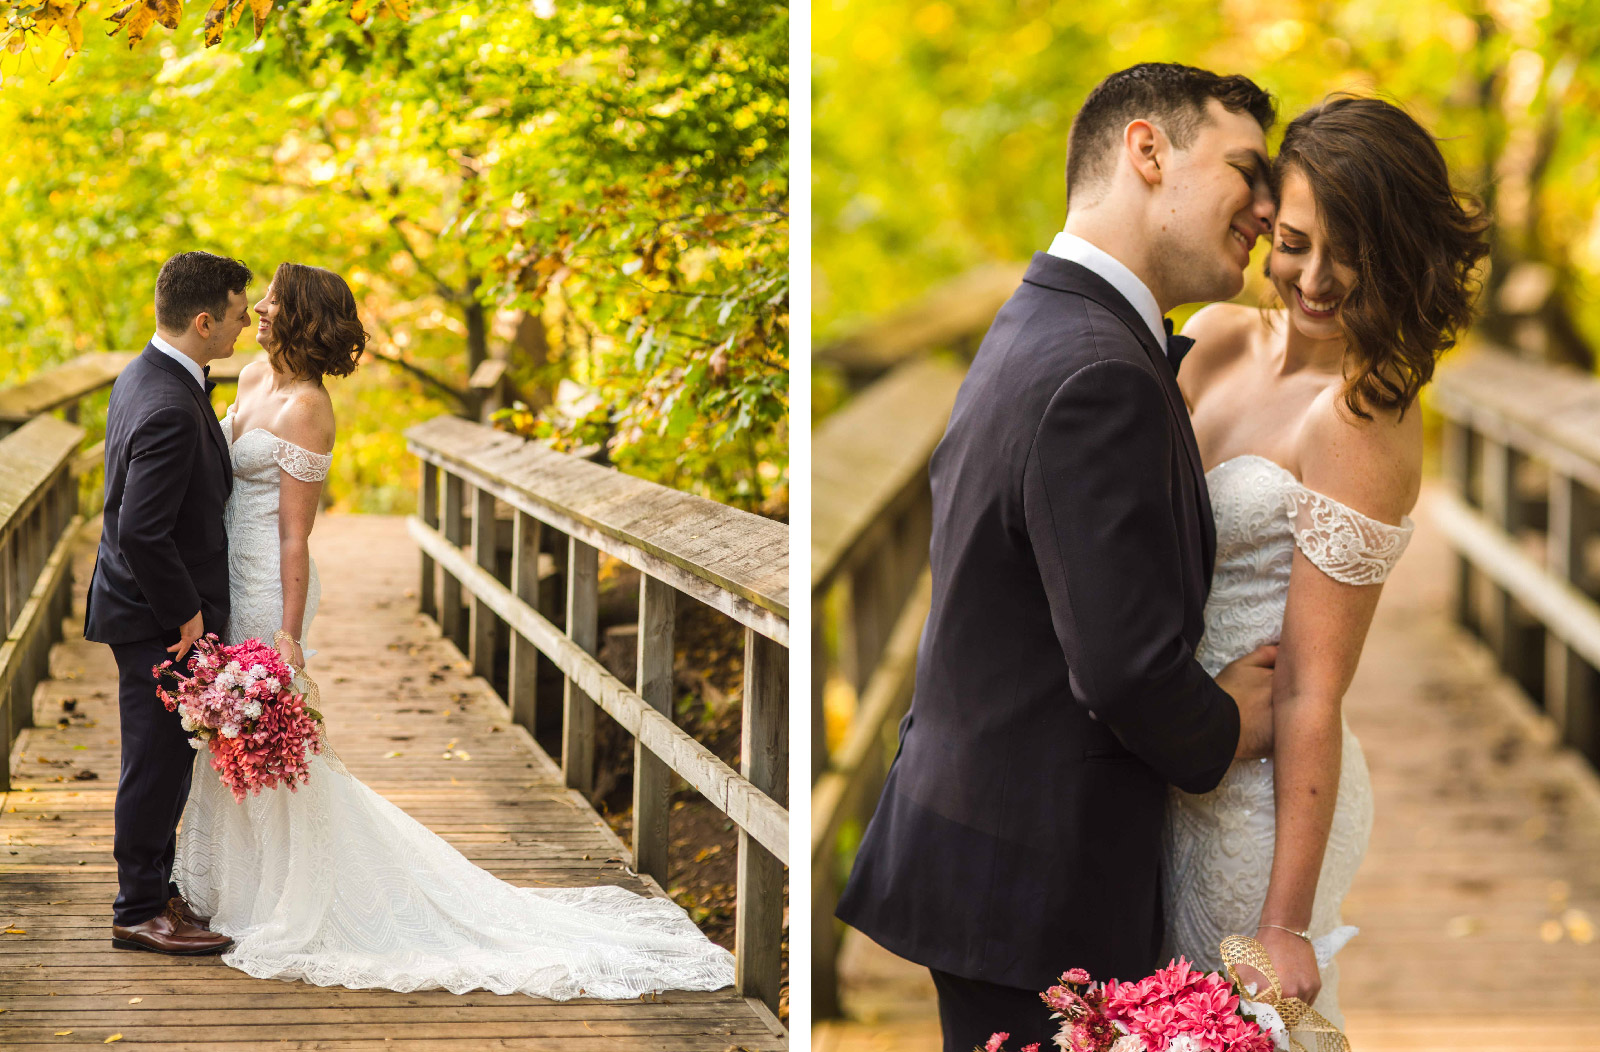 Mike & Allison Bridge Hush Hush Photography & Film Aidan Hennebry Hamilton Wedding Photographer Videographer-01.jpg